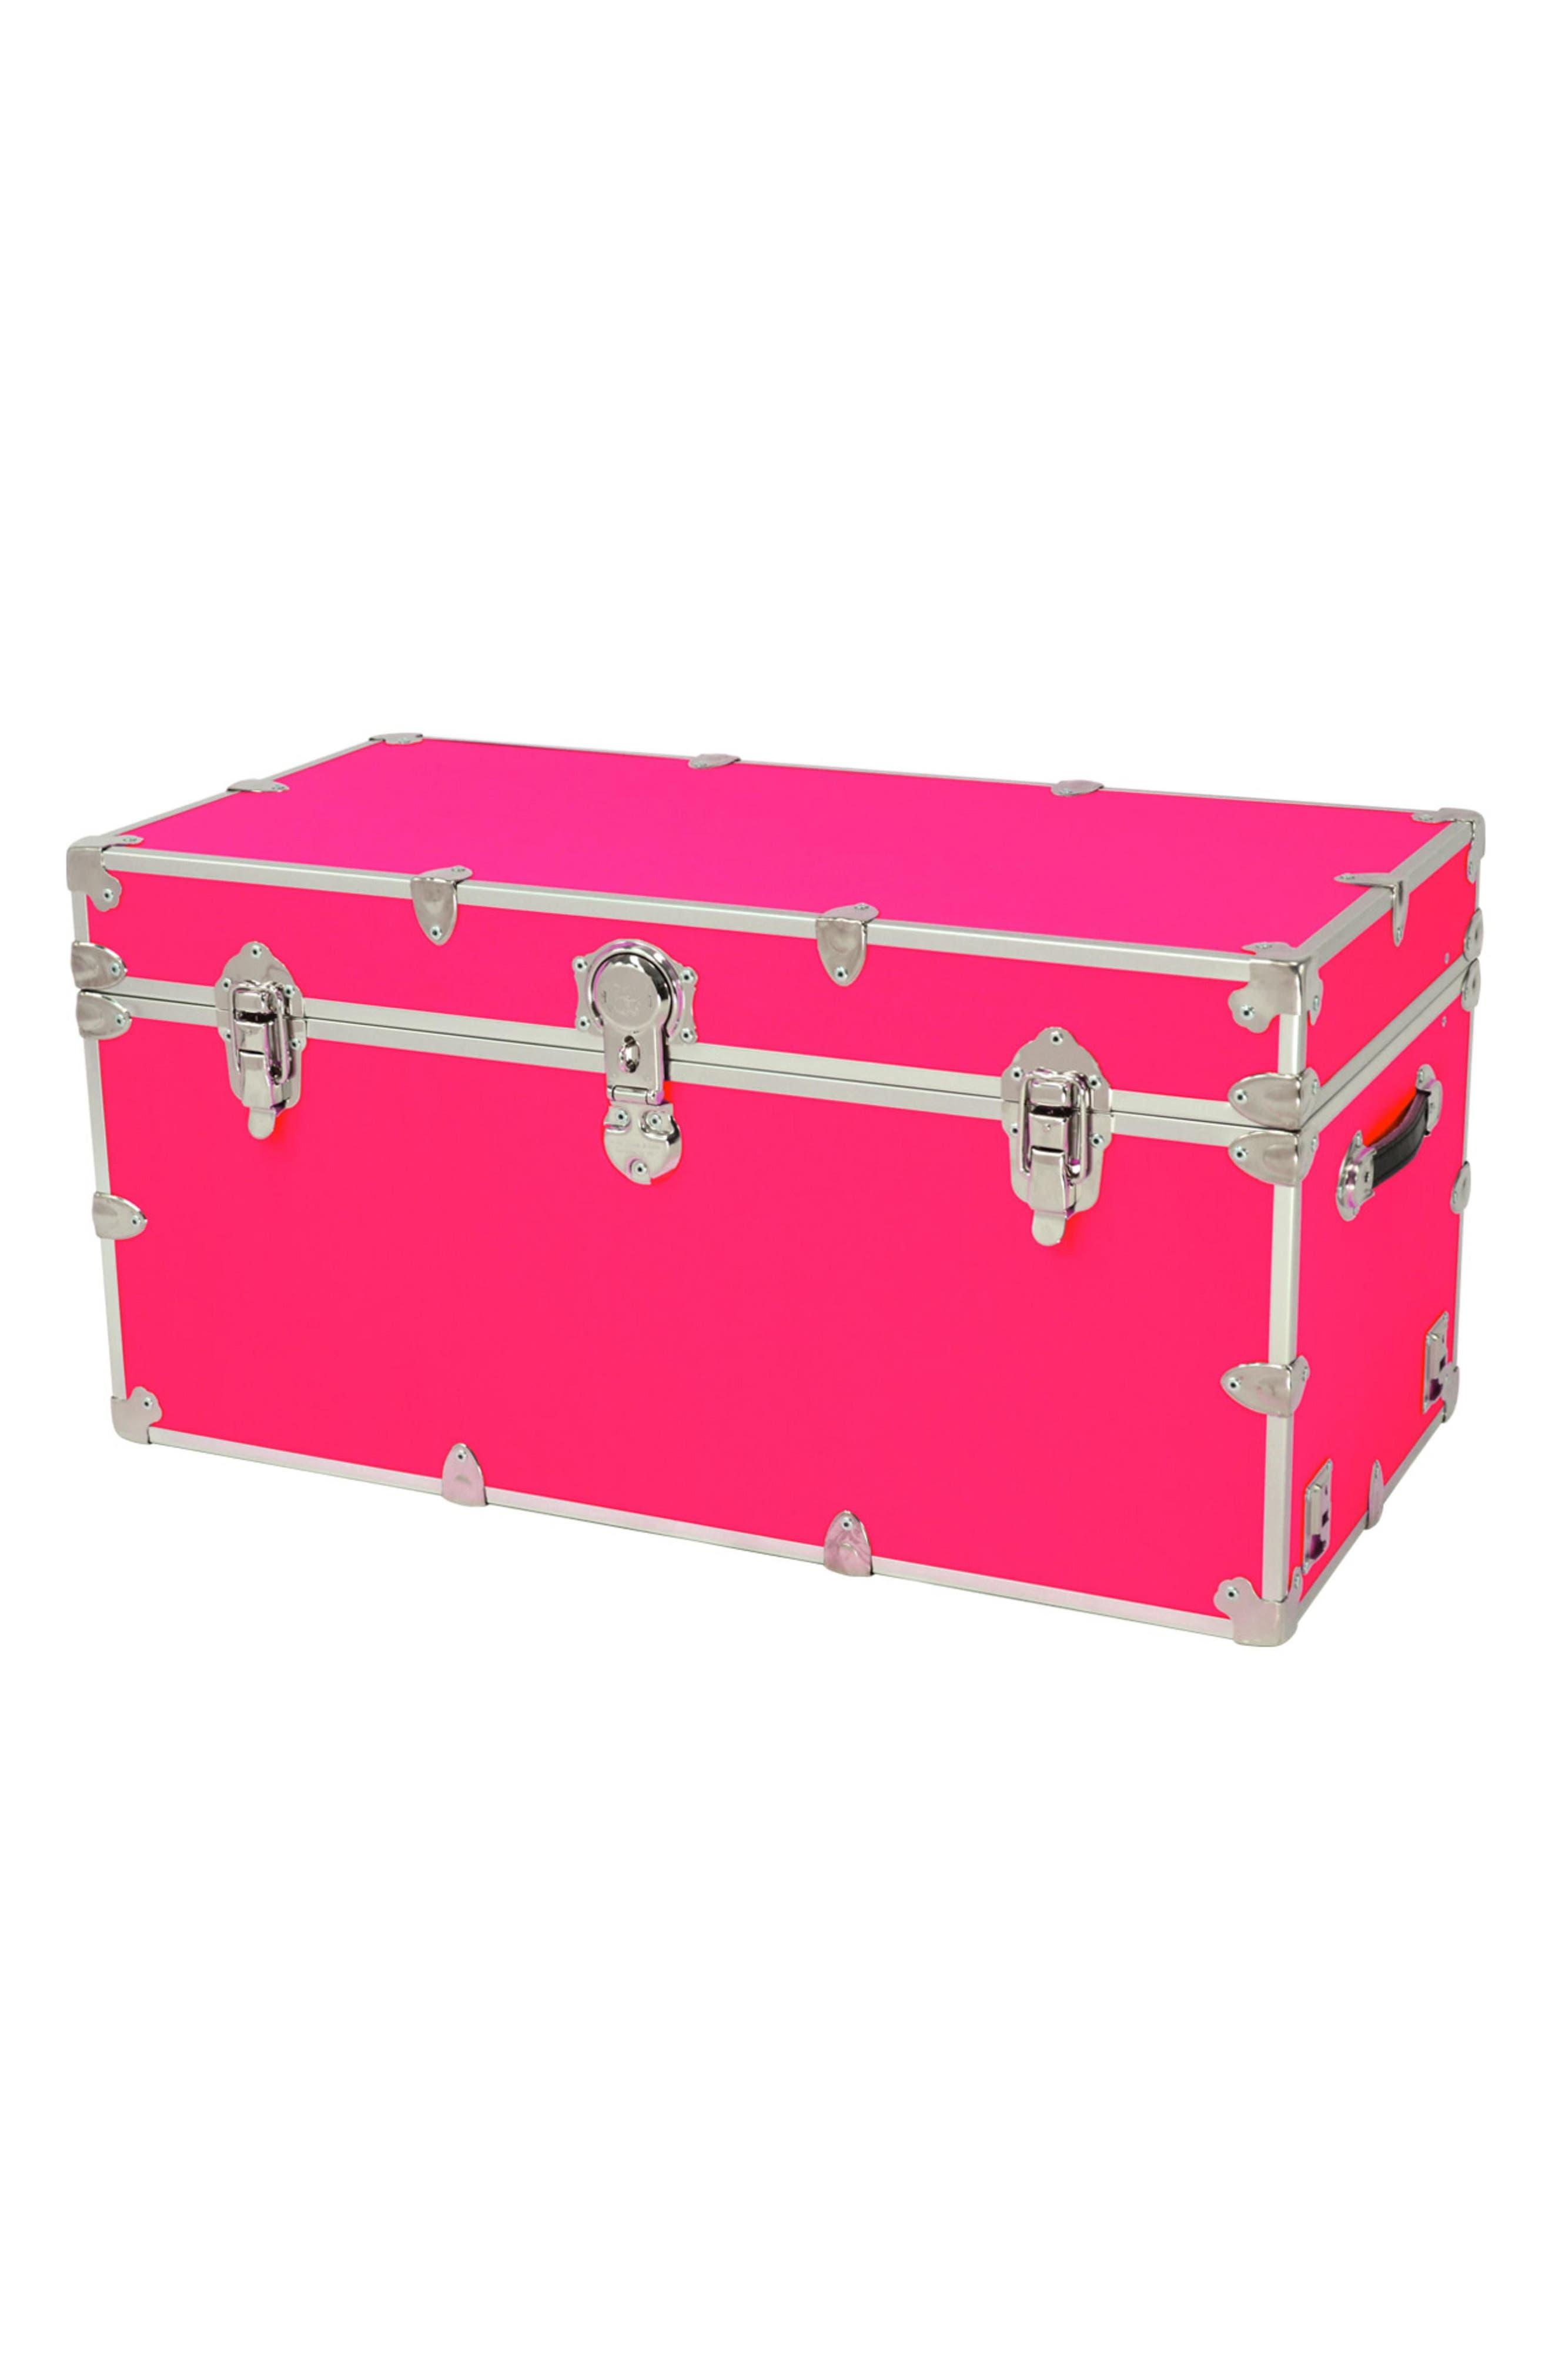 Rhino Trunk & Case XXL Armor Trunk,                             Main thumbnail 1, color,                             Neon Pink